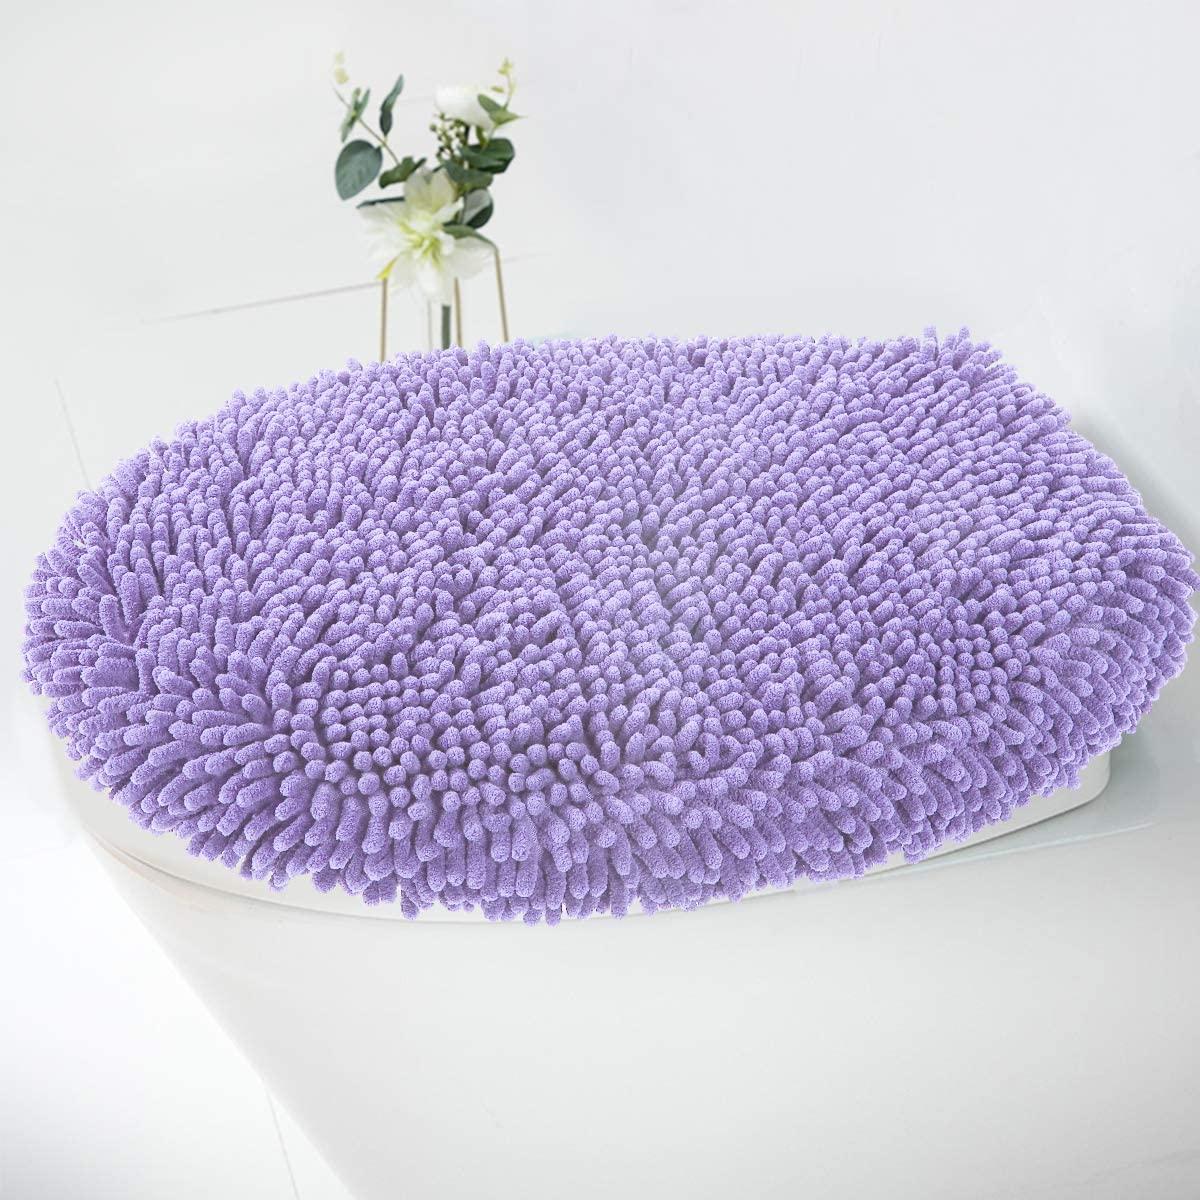 MAYSHINE Seat Cloud Bath Washable Shaggy Microfiber Standard Toilet Lid Covers for Bathroom -Lavender